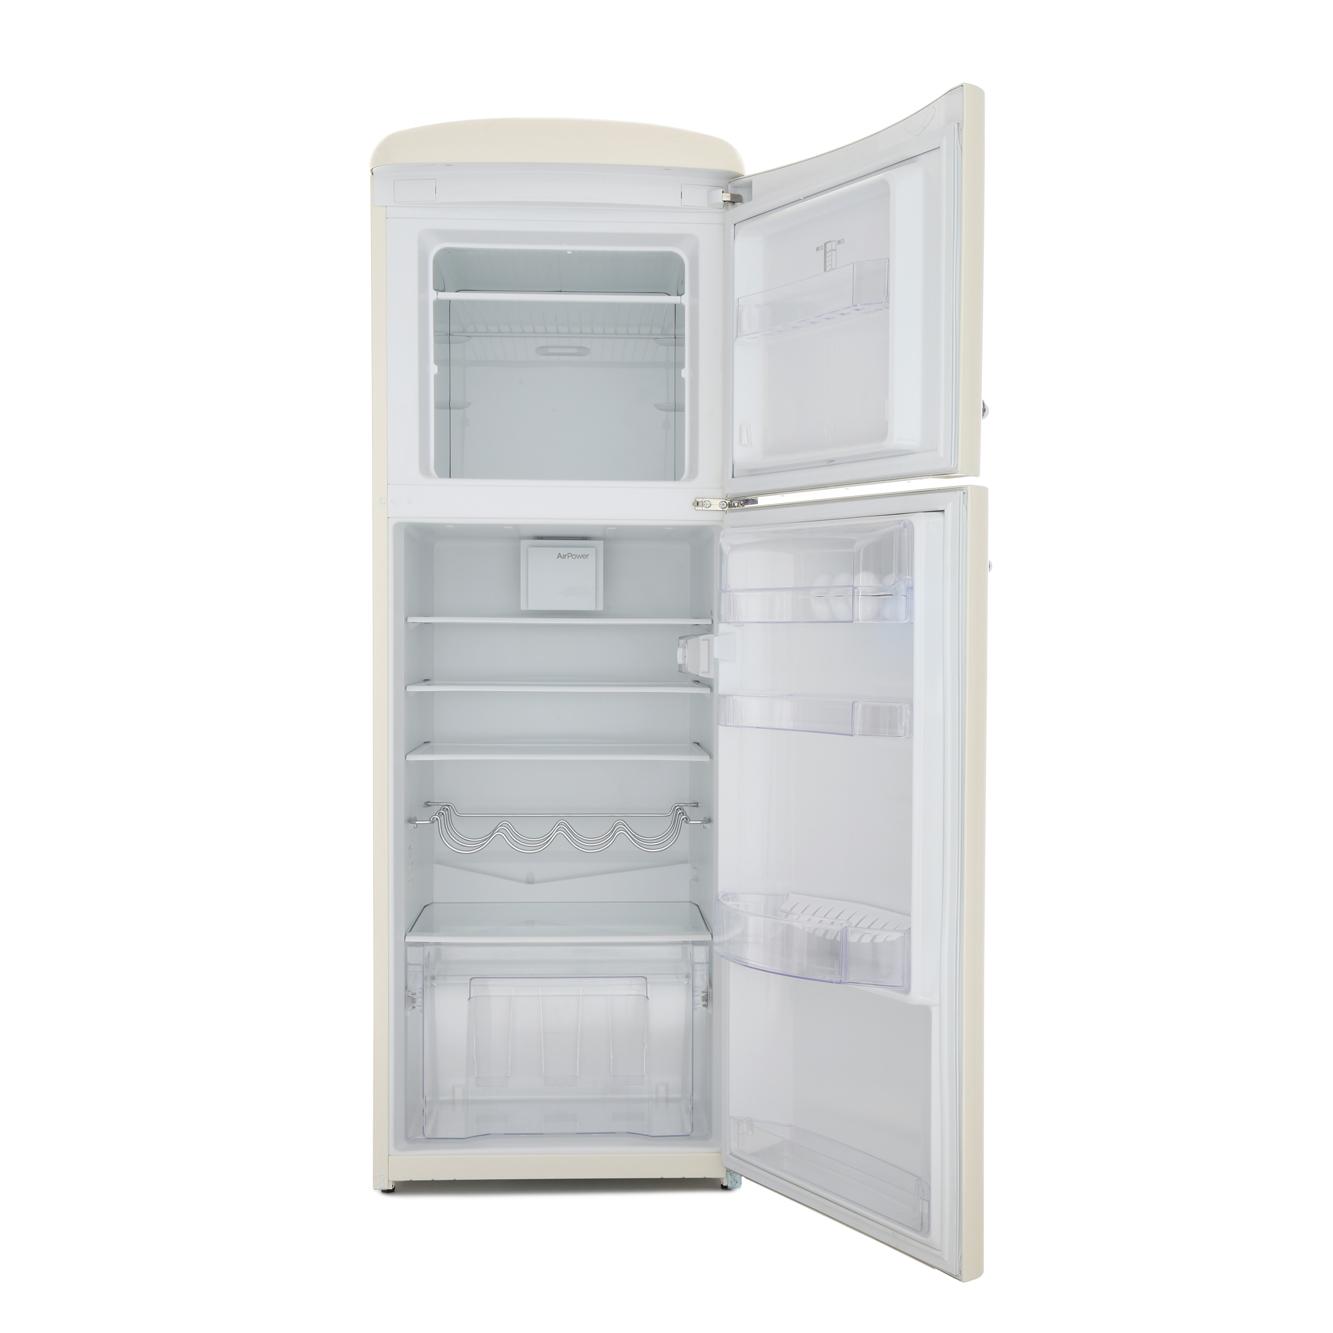 Buy Gorenje Retro Vintage RF60309OC Fridge Freezer